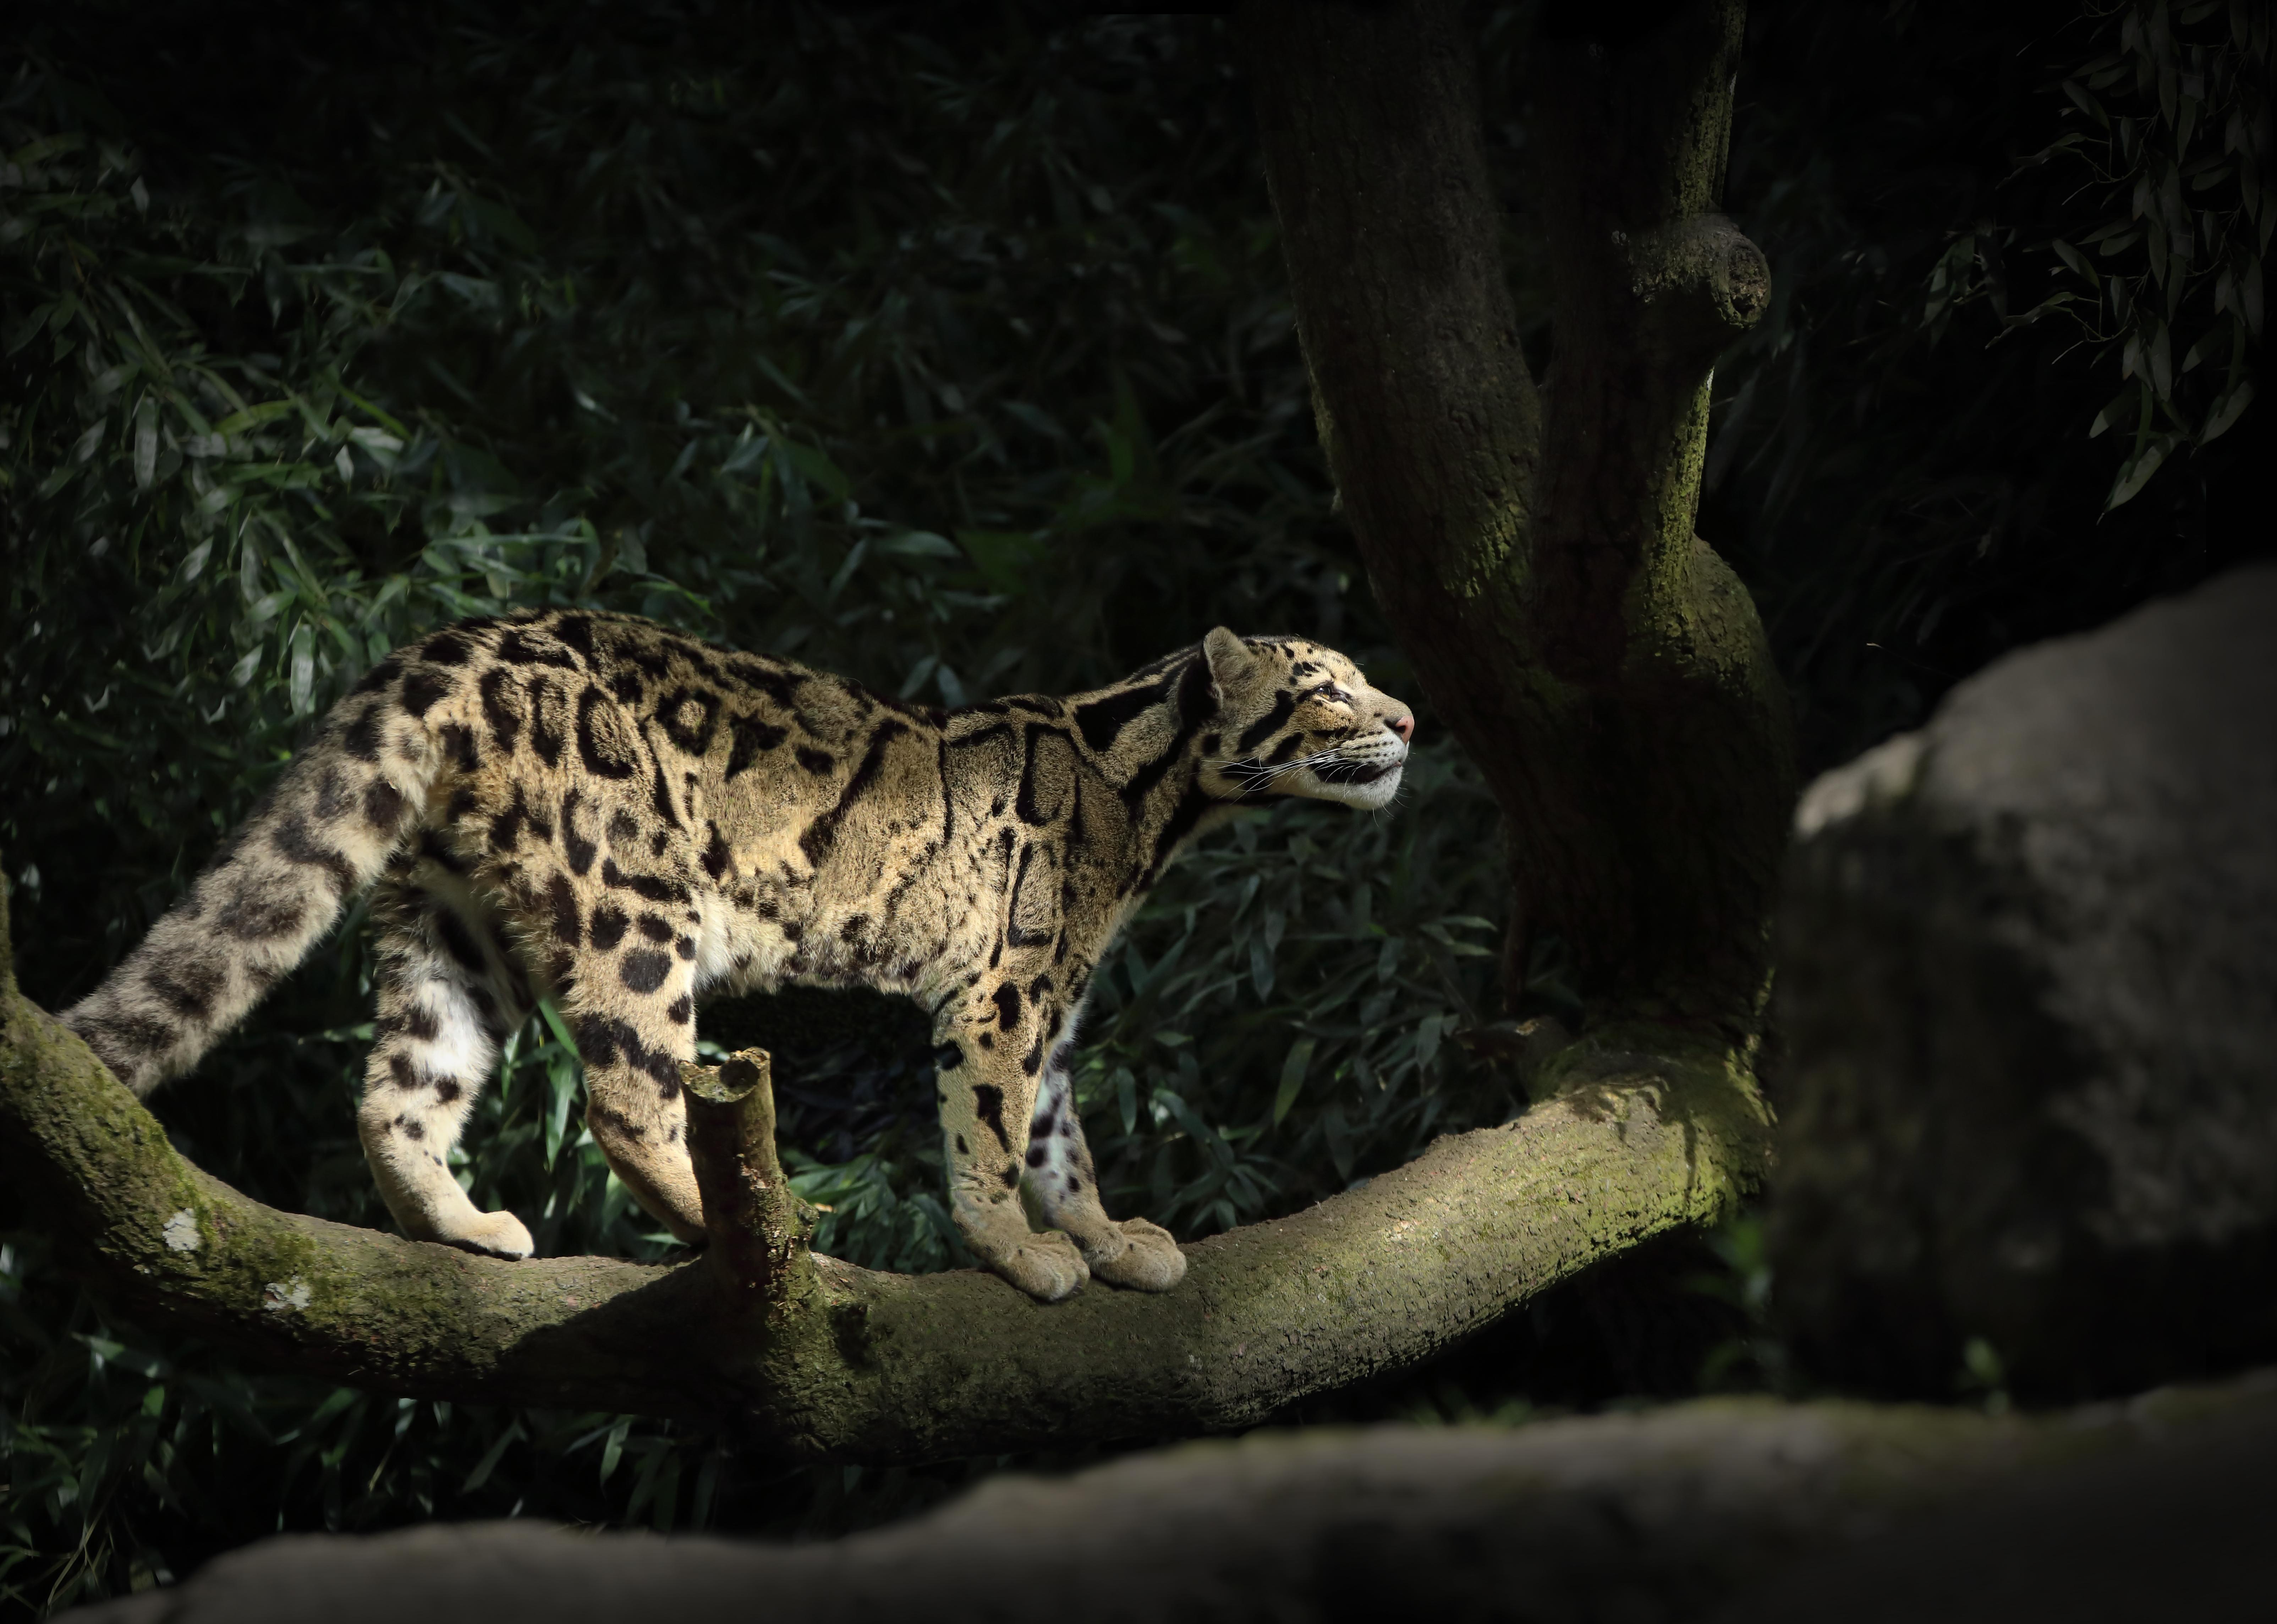 leopard silent walk 1574938077 - Leopard Silent Walk -